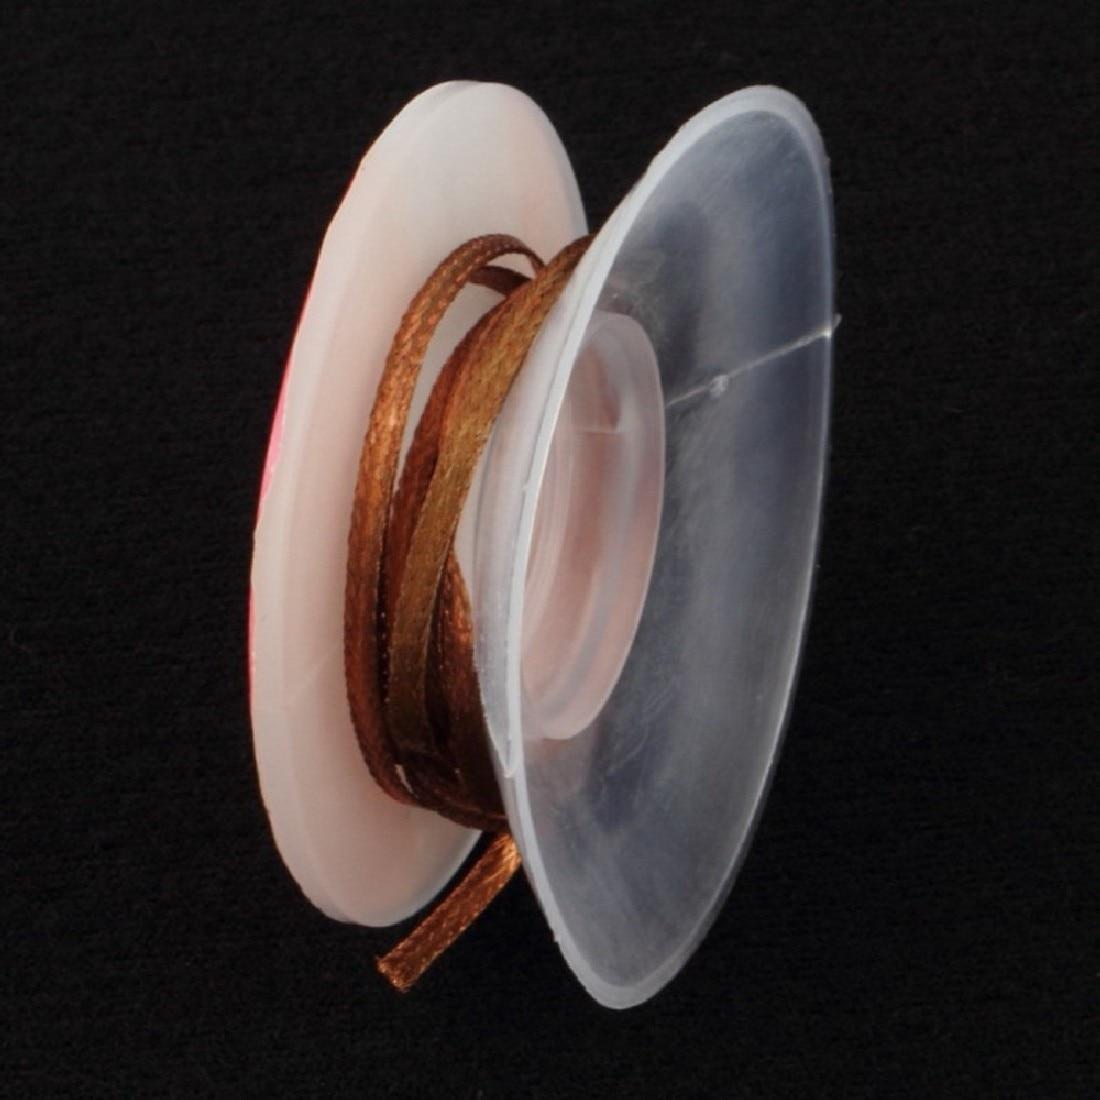 Демонтажный фитиль 1,5 м 2,0 мм оплётка для снятия фитиль BGA бюстгальтер для демонтажа по всему миру